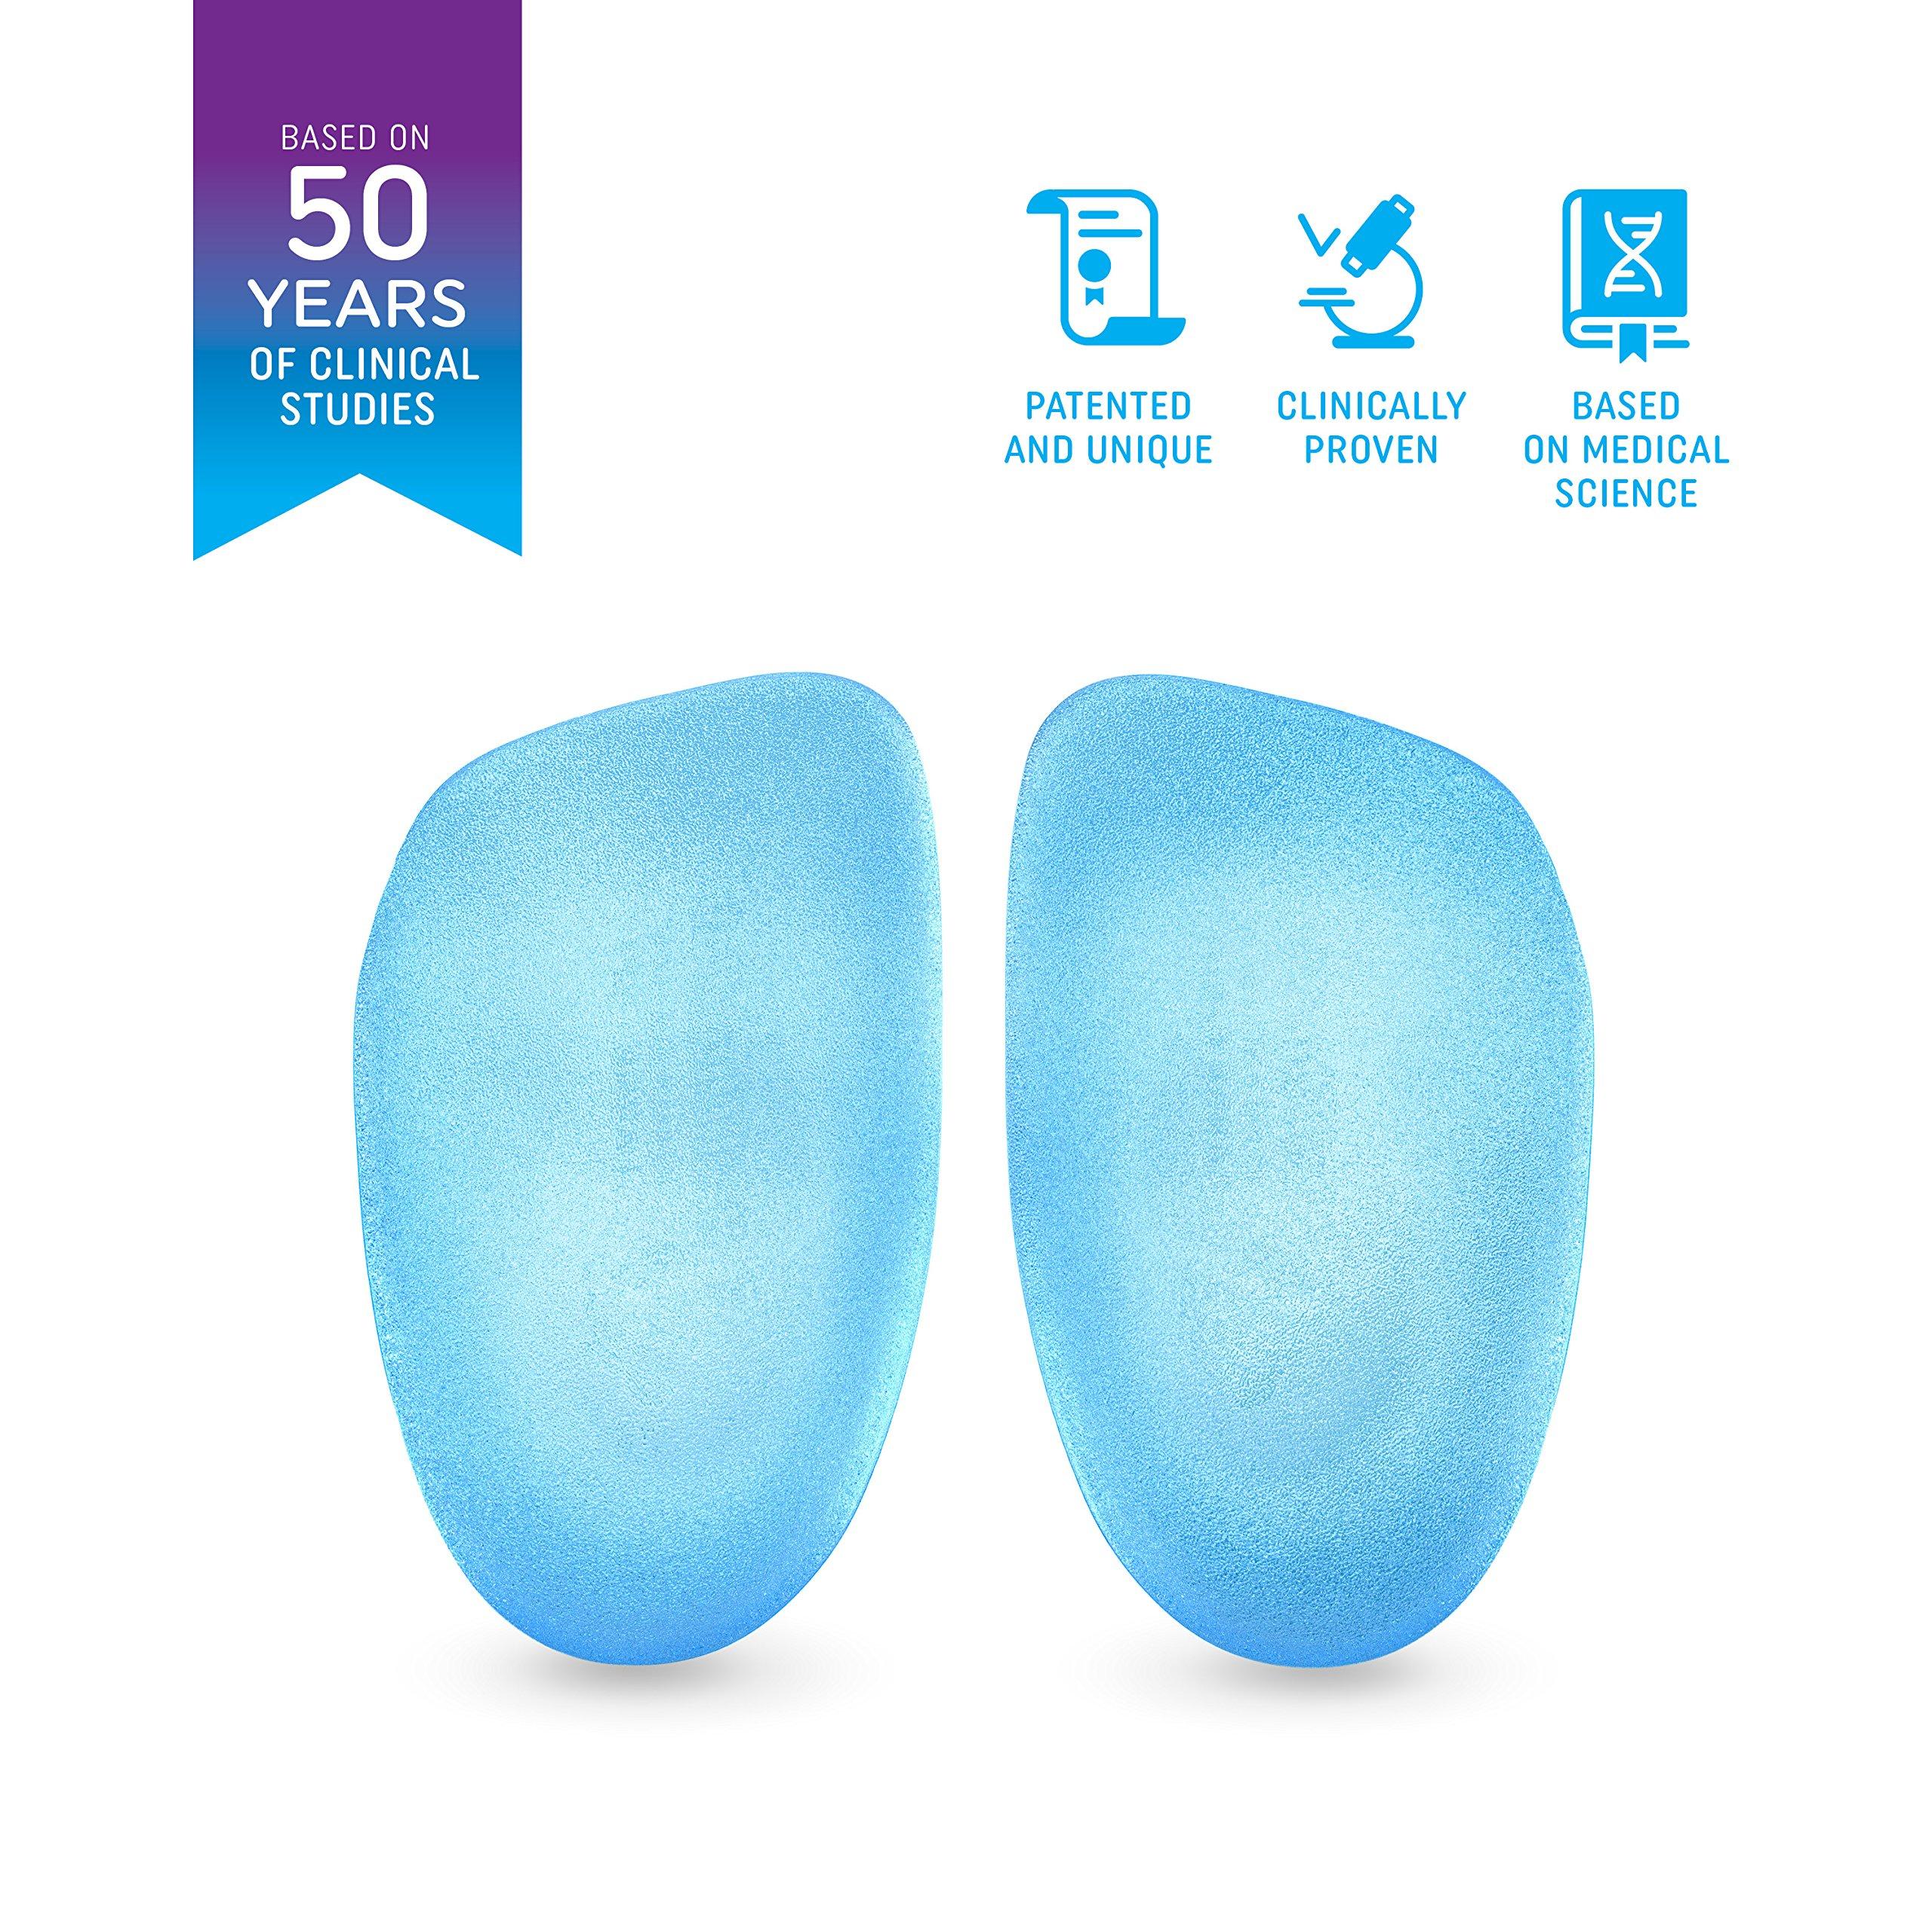 Heel That Pain GEL Heel Seats Foot Orthotic Inserts - Heel Cups Cushions Insoles for Plantar Fasciitis, Heel Spurs, and Heel Pain, Medium (Women's 6.5-10, Men's 5-8) by Heel That Pain (Image #5)